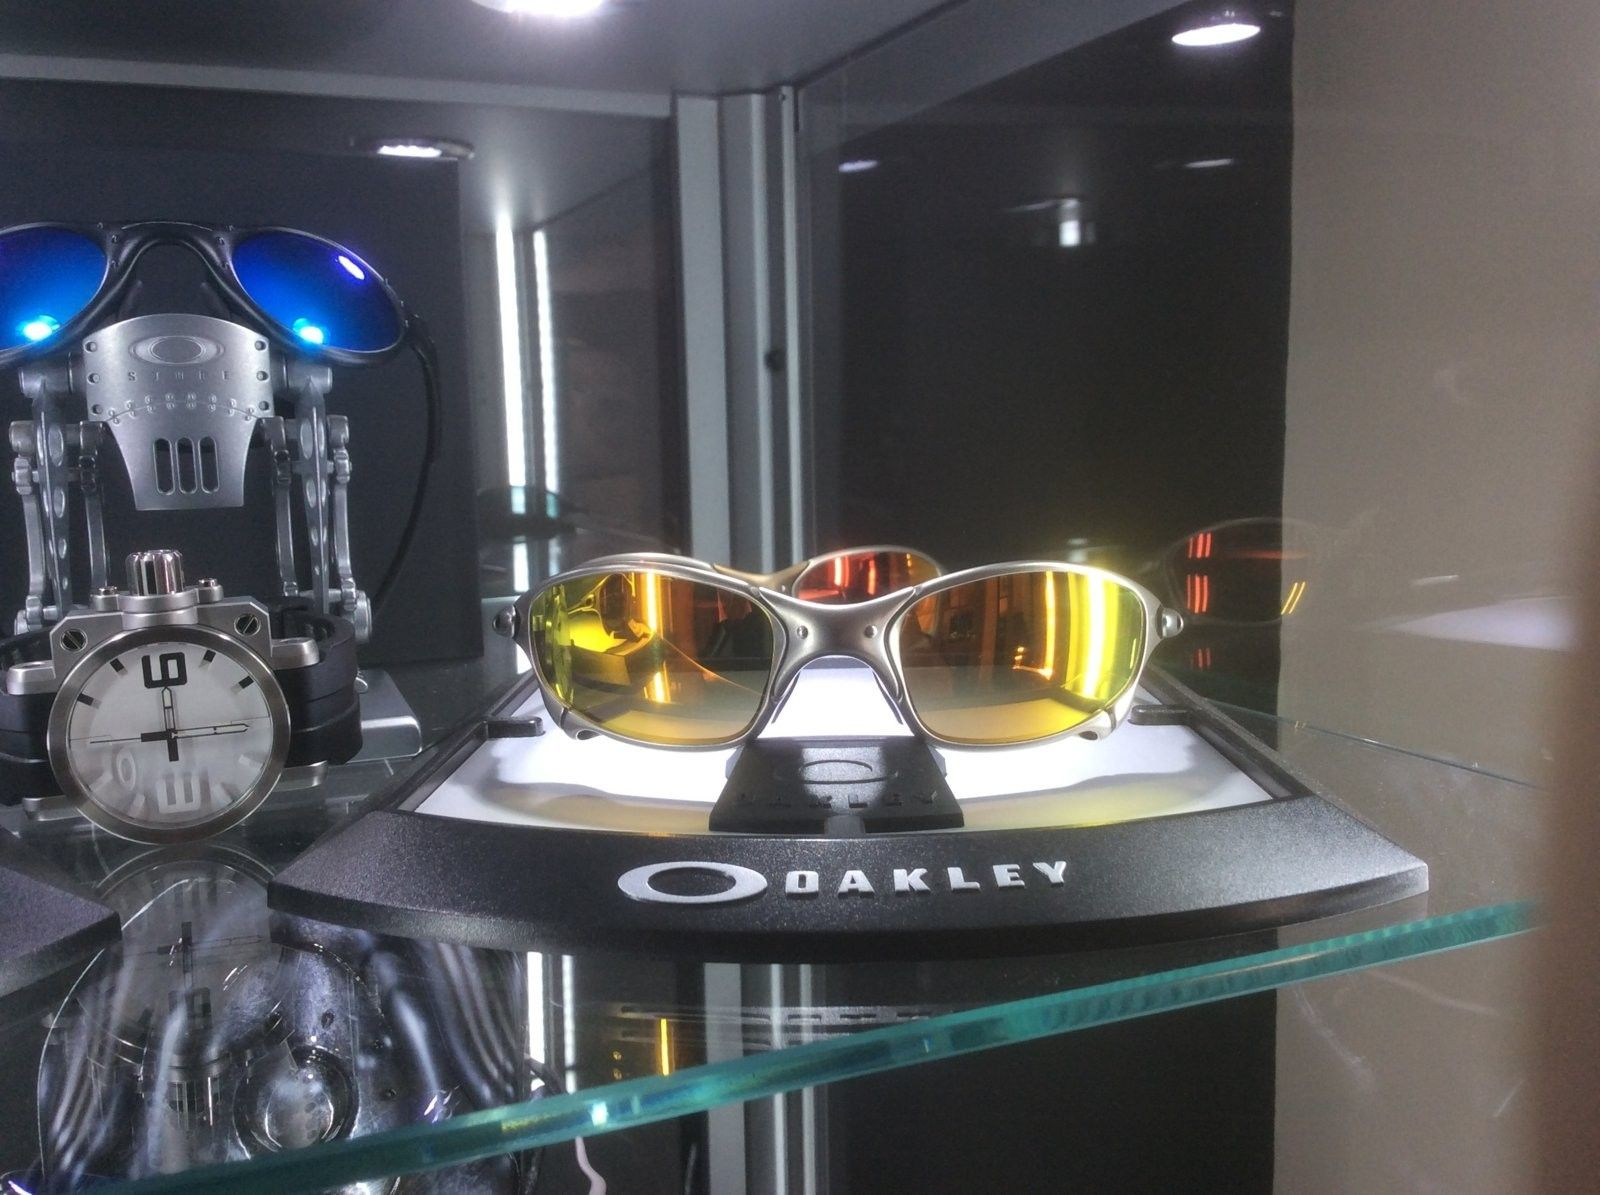 Oakley tune up on my juliets - image.jpeg